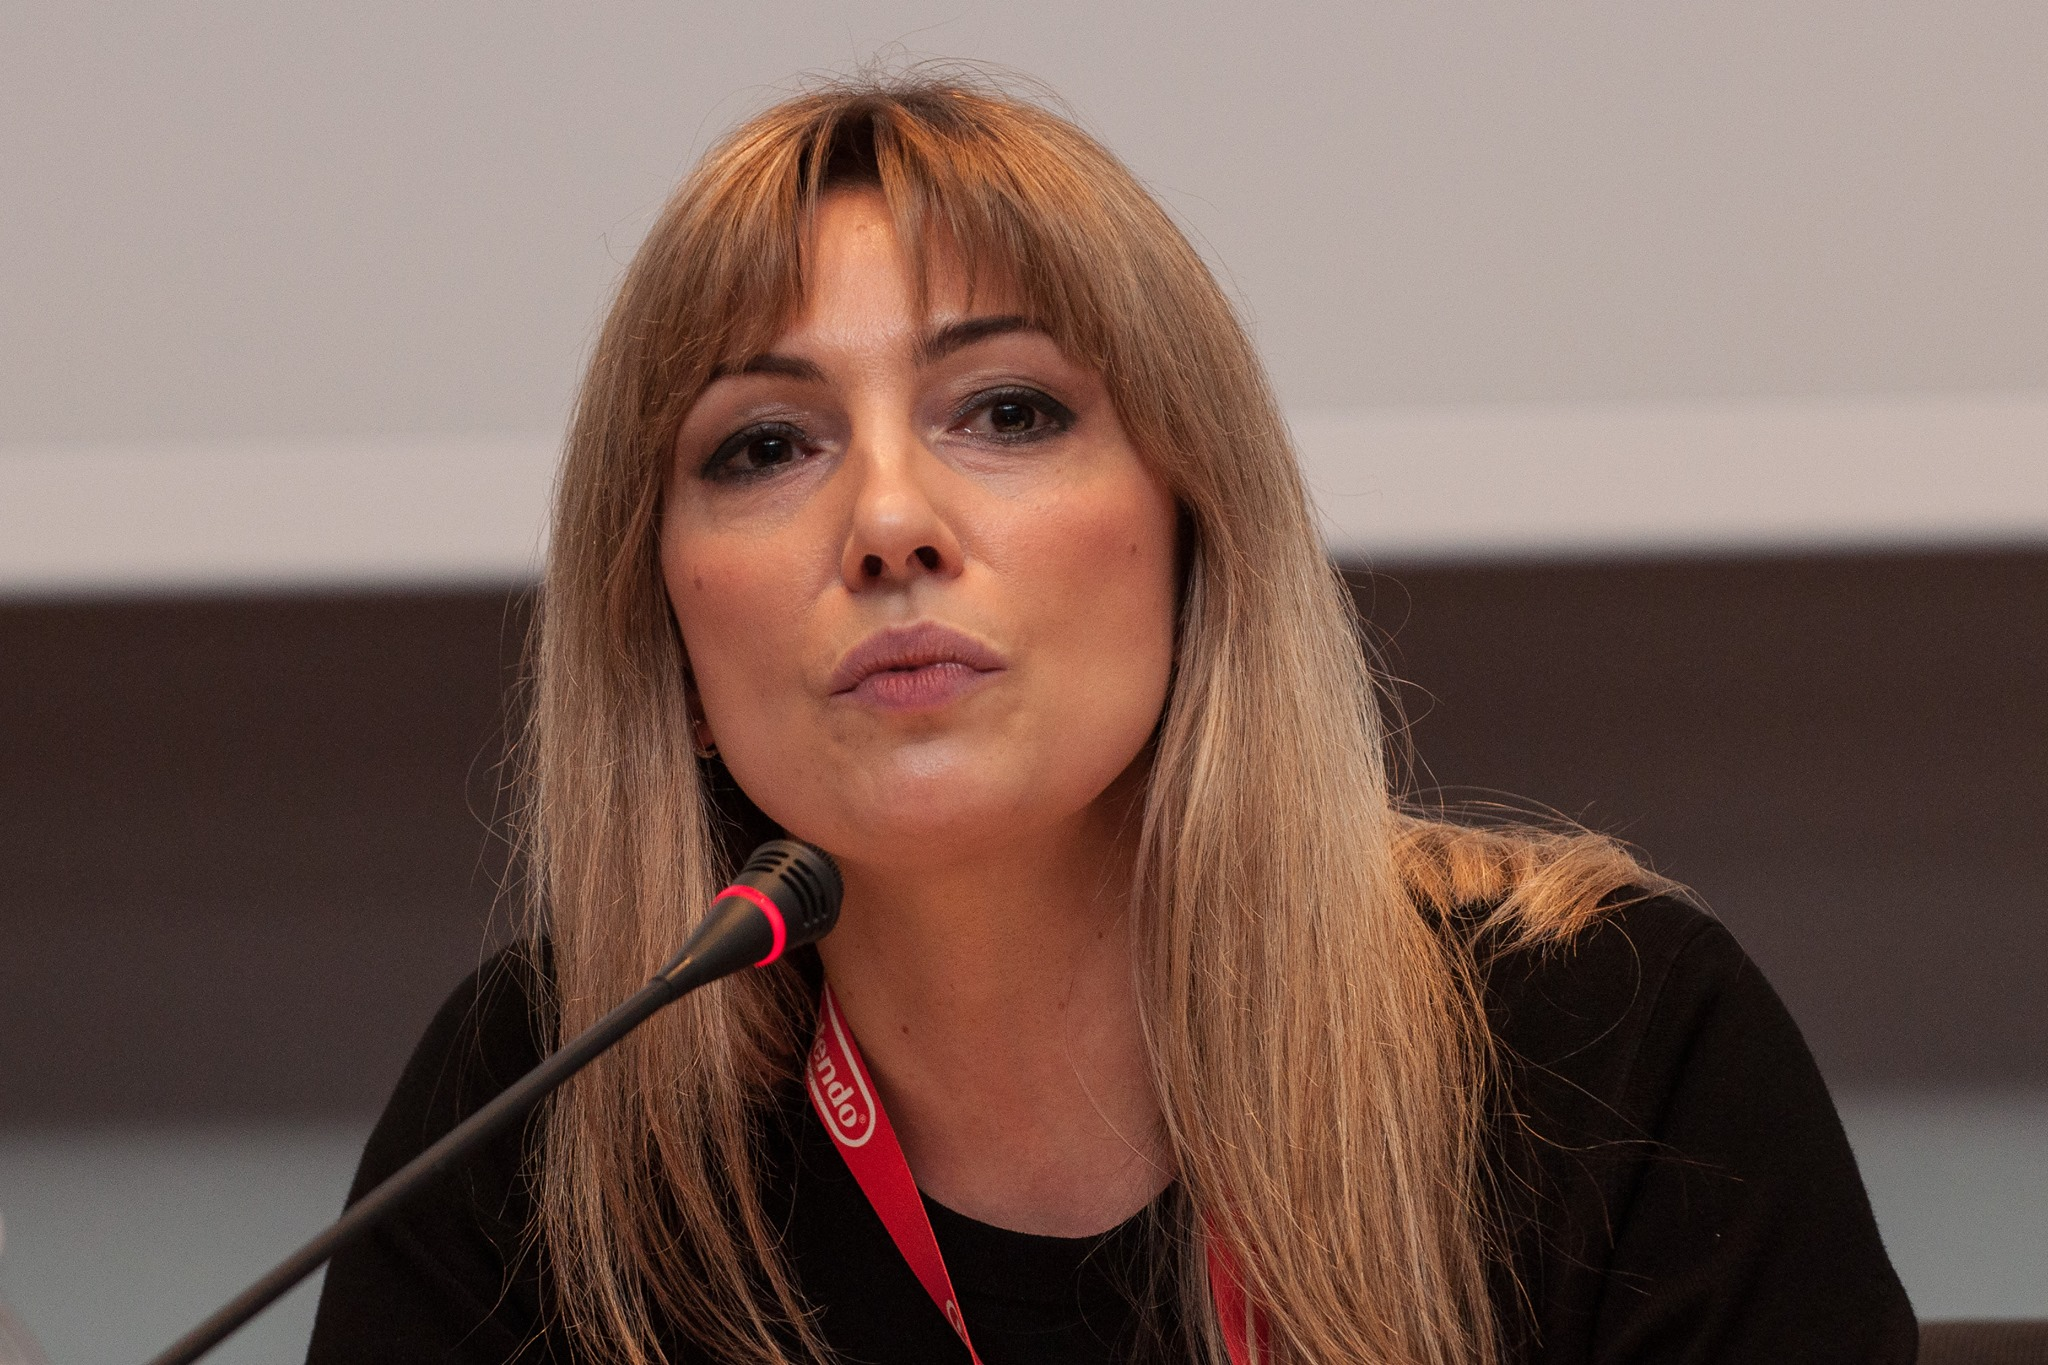 Rachele Doimo